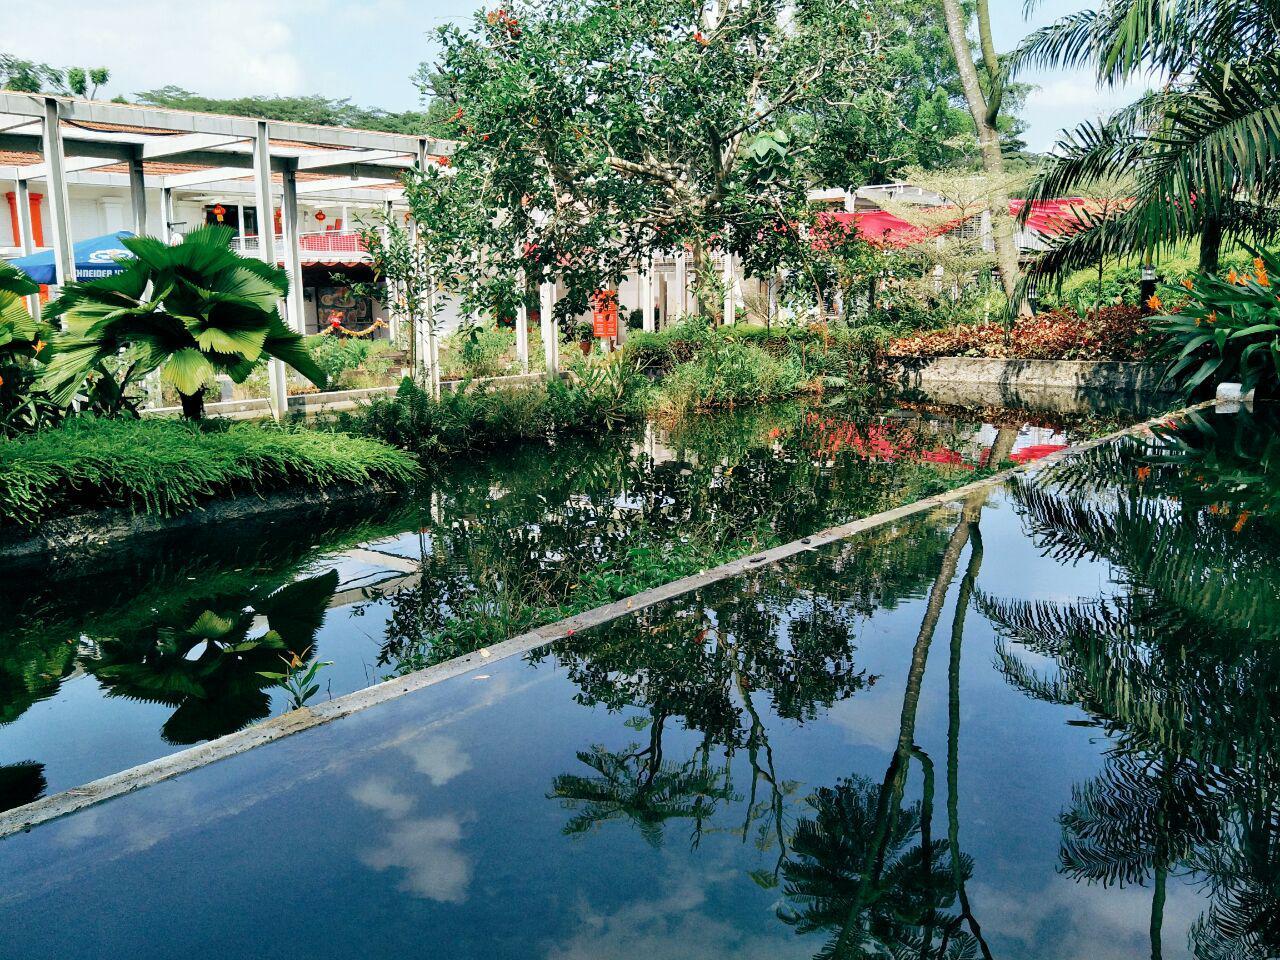 Huber's Pond